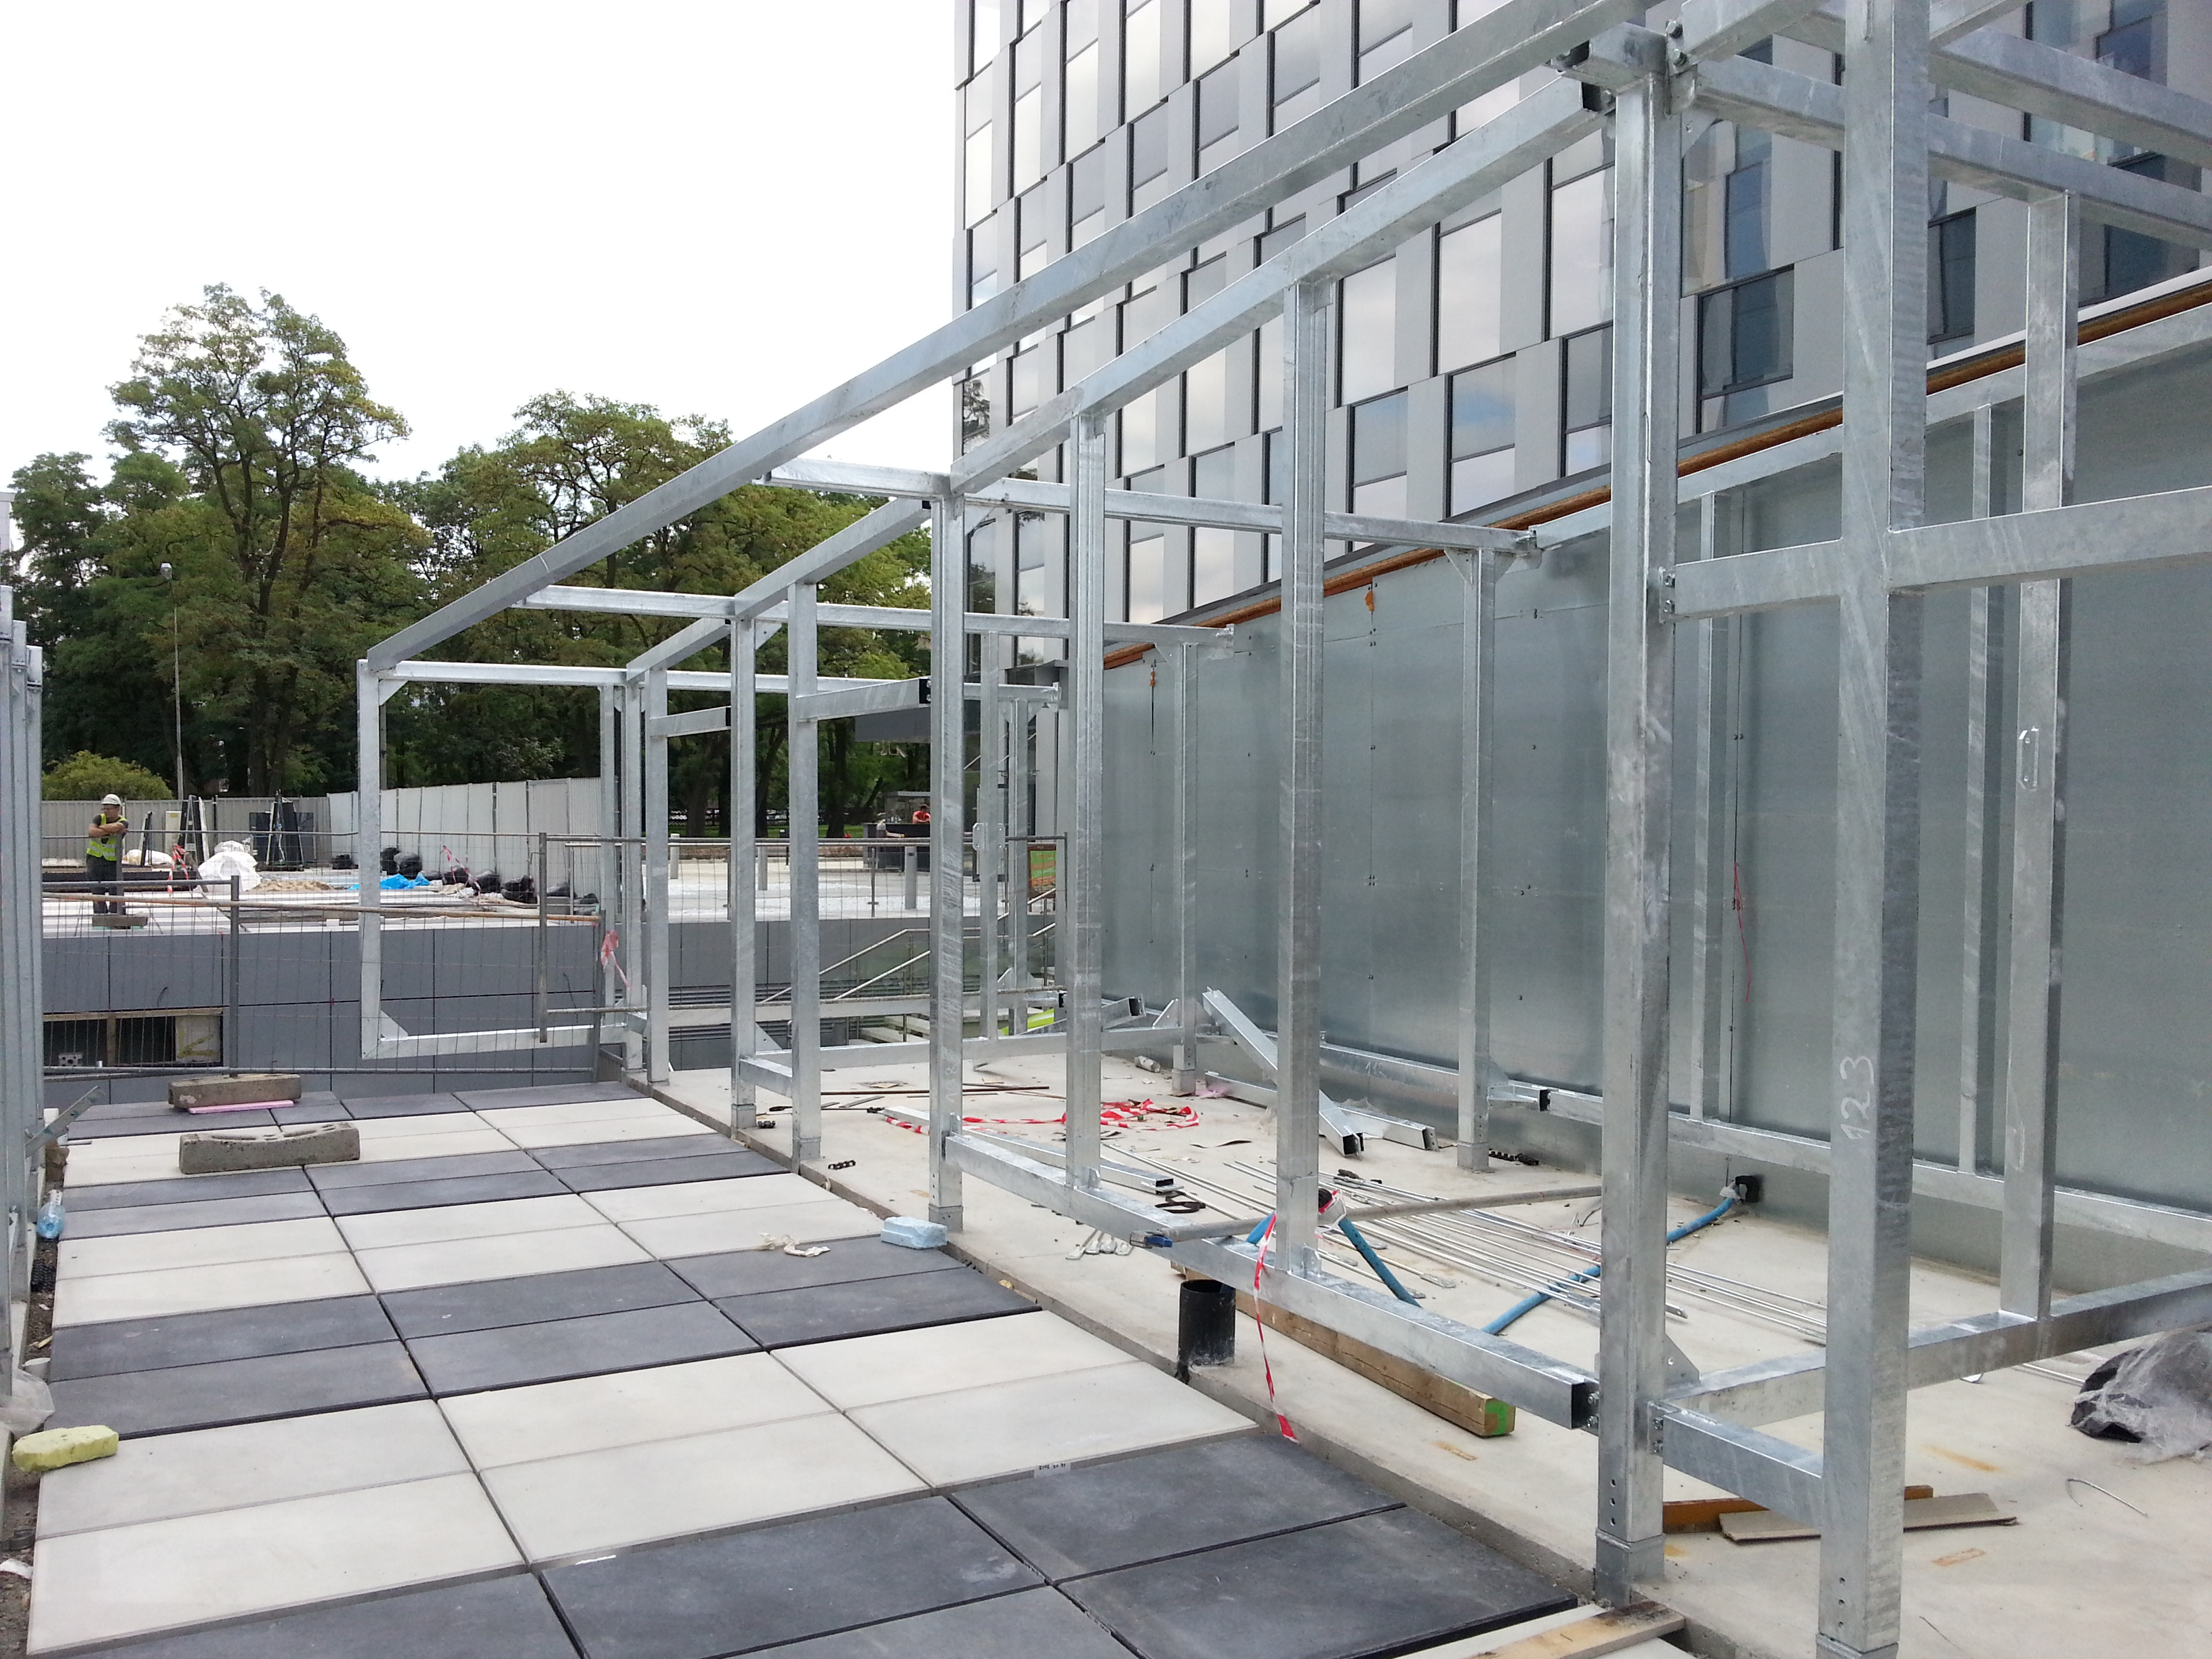 konstrukcje stalowe arpal-podkonstrukcje arpal